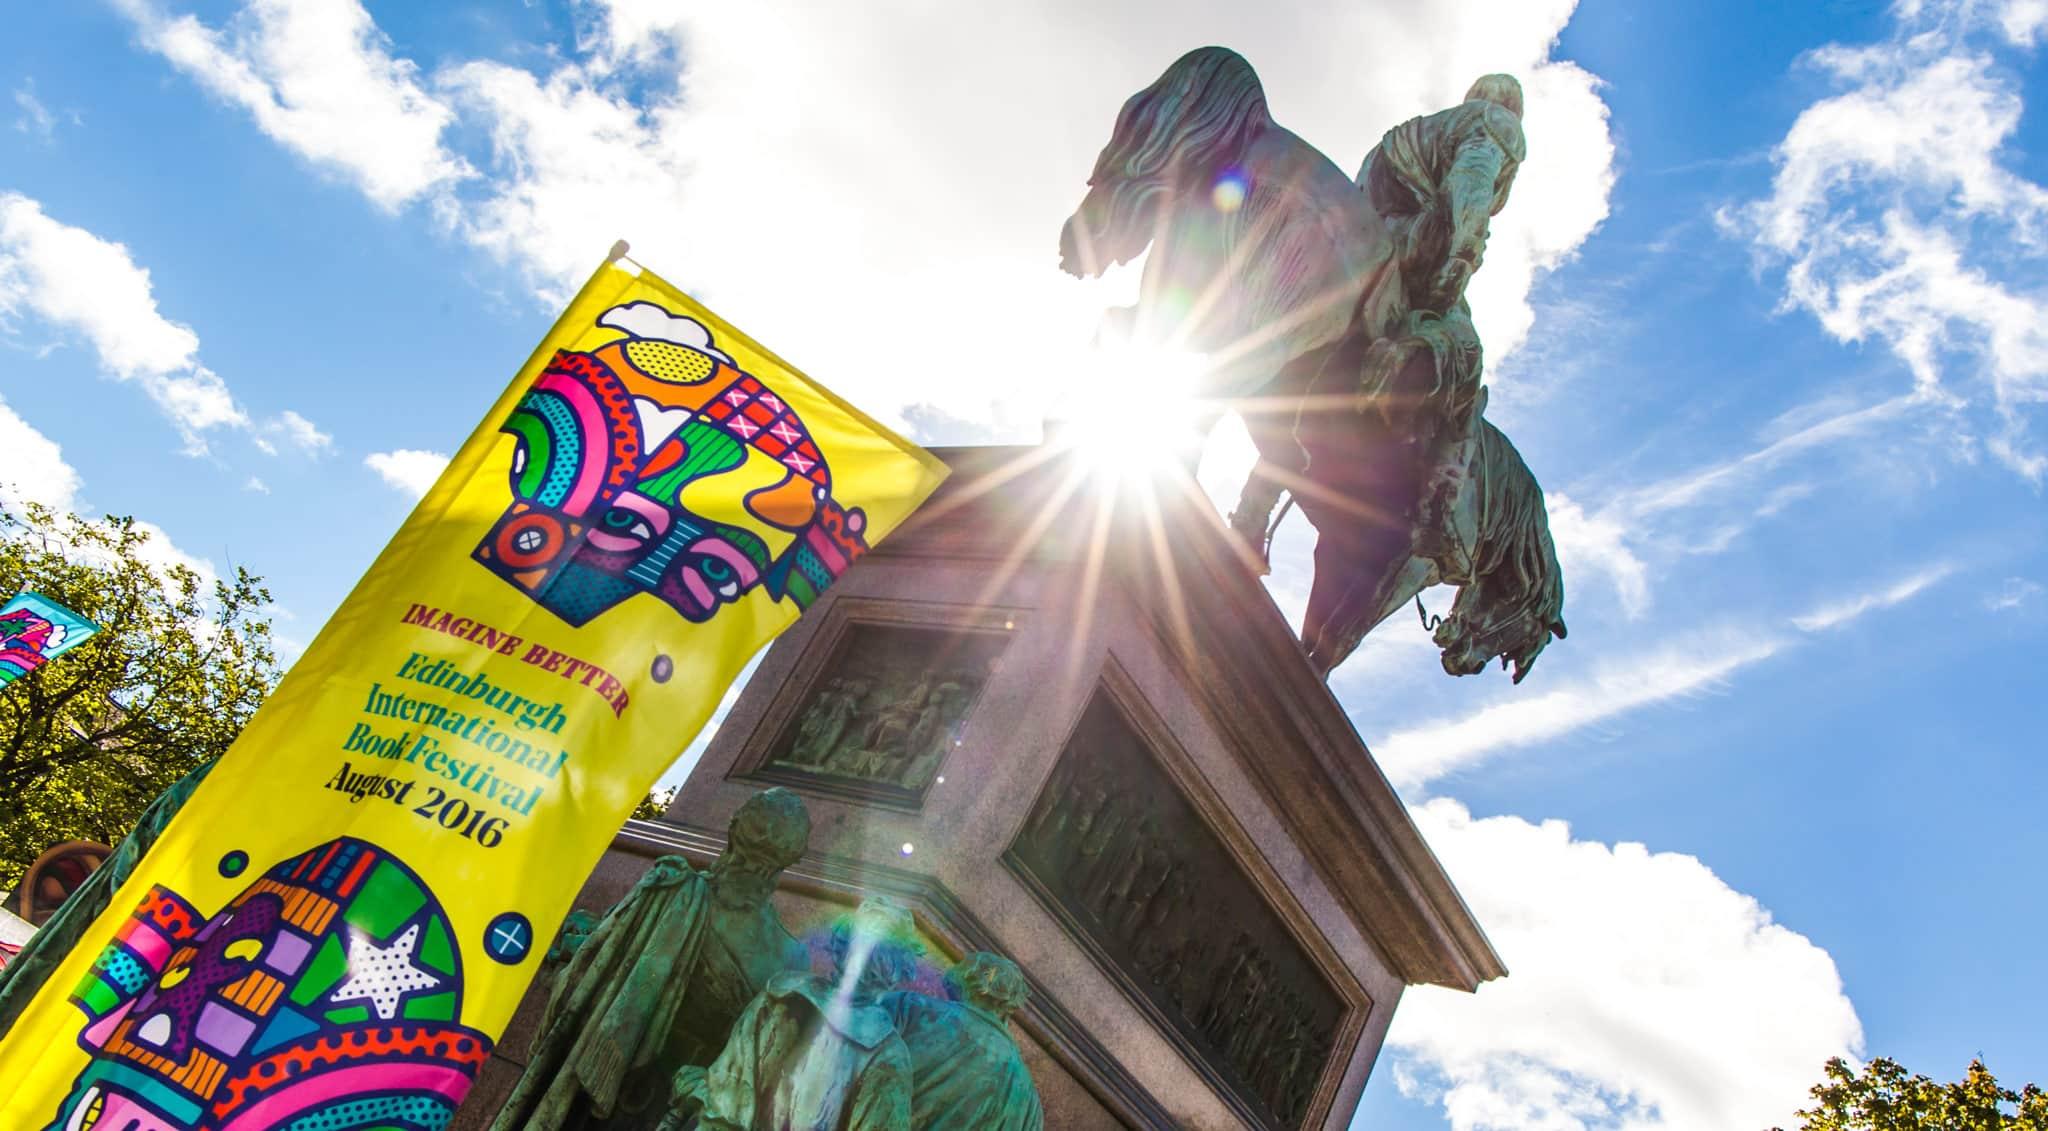 Festival del Libro de Edimburgo en agosto